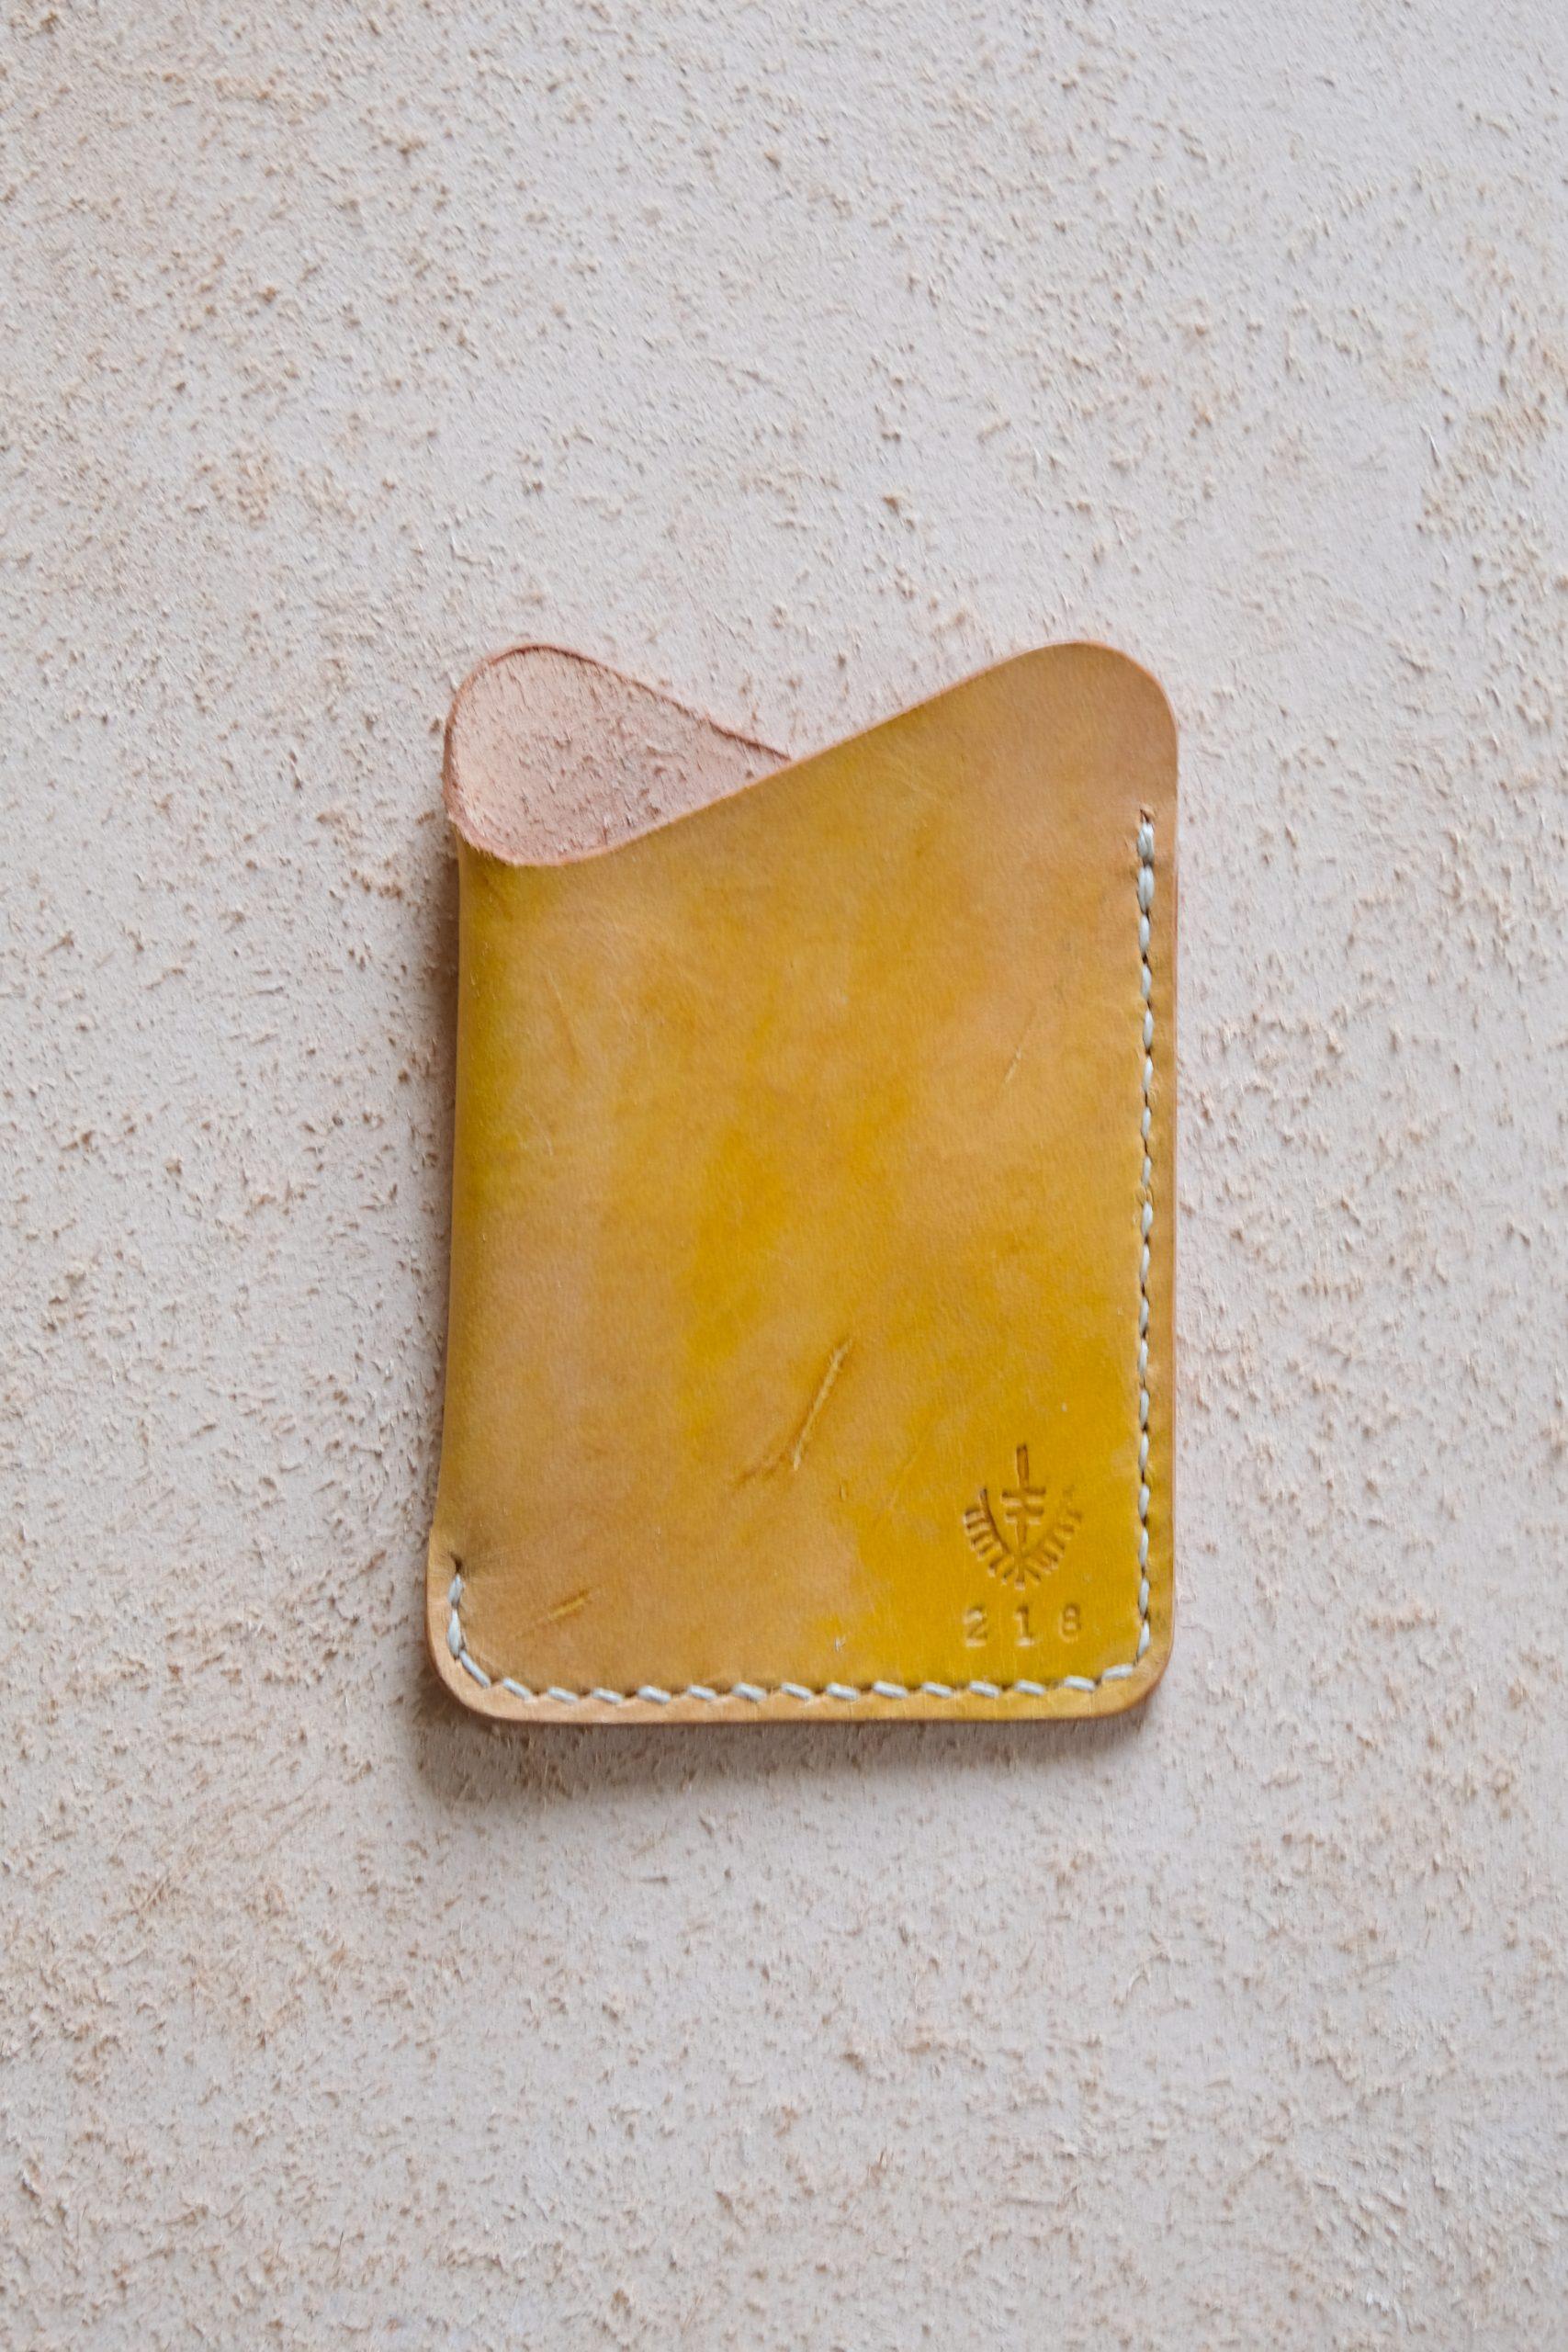 lerif designs leather wave cardholder turmeric on beige background